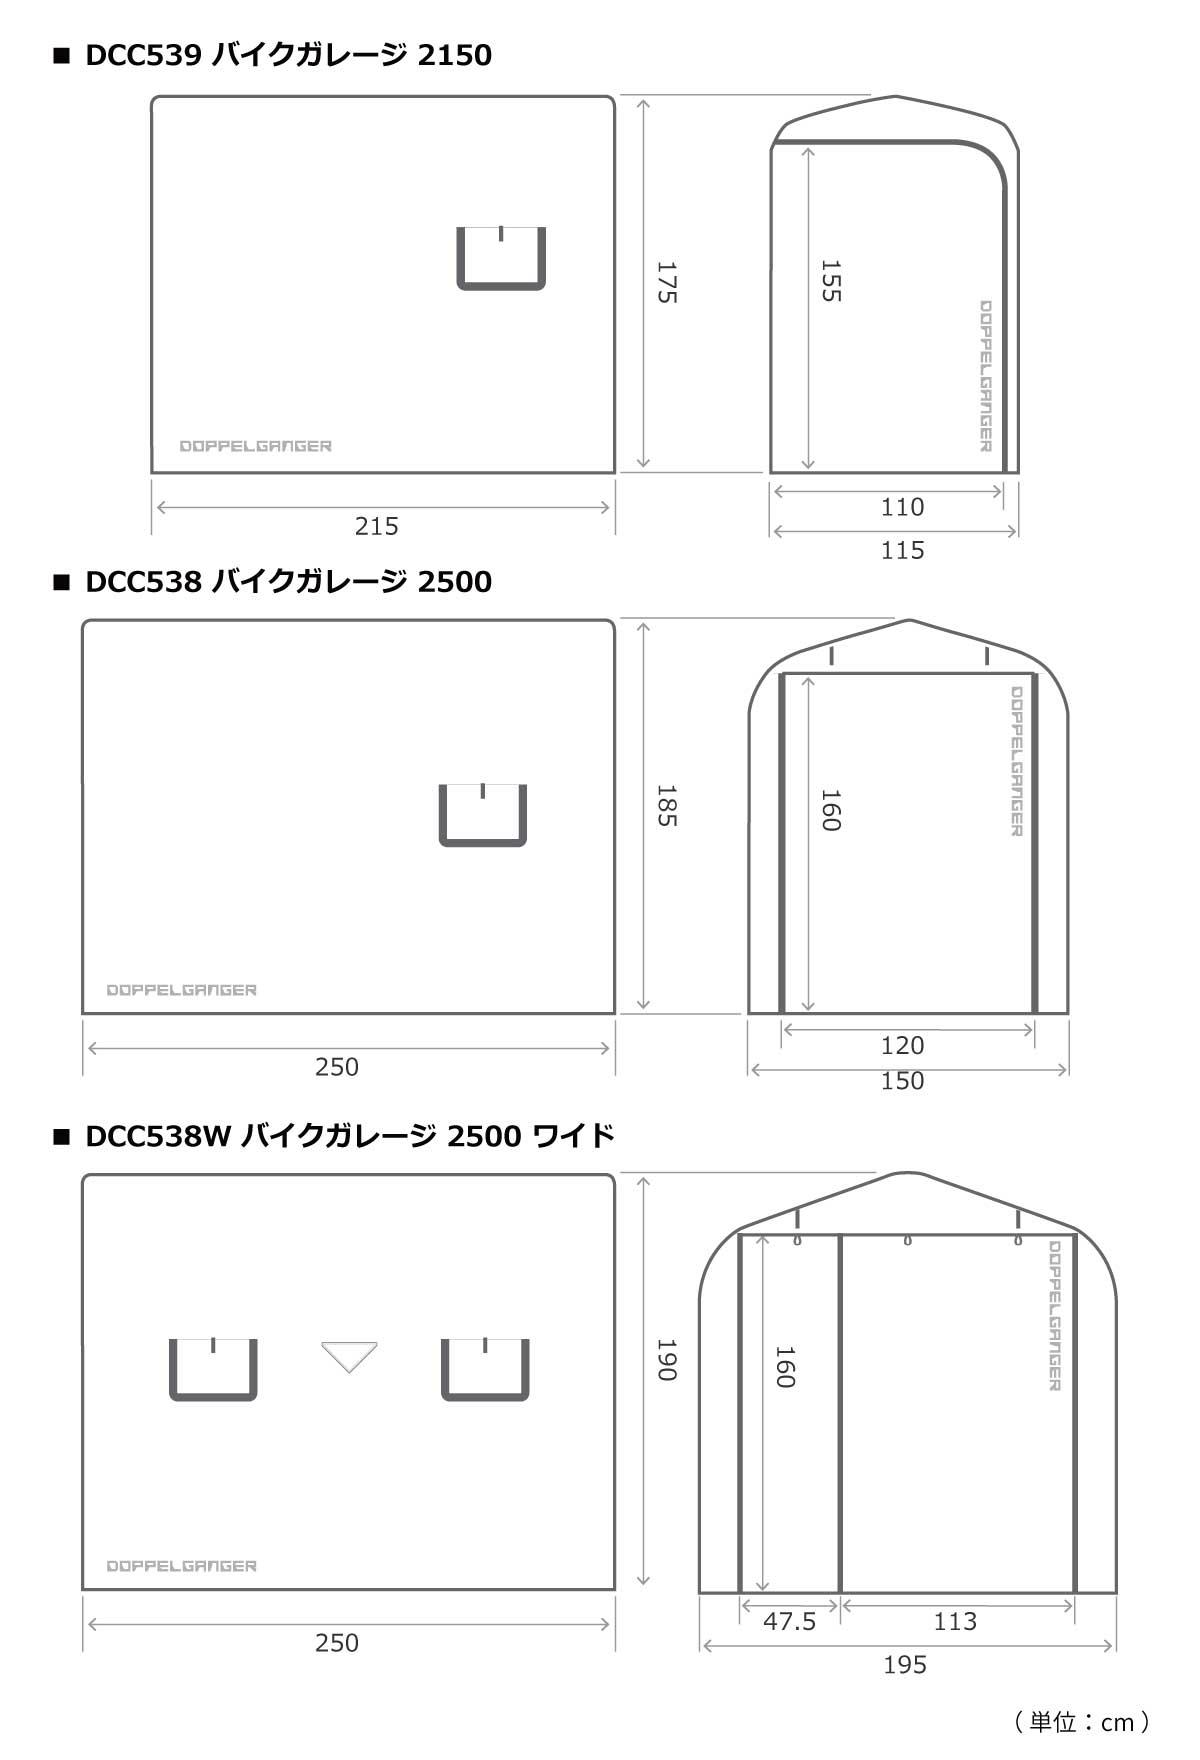 DCC538W-GY バイクガレージ 2500 ワイド サイズ画像